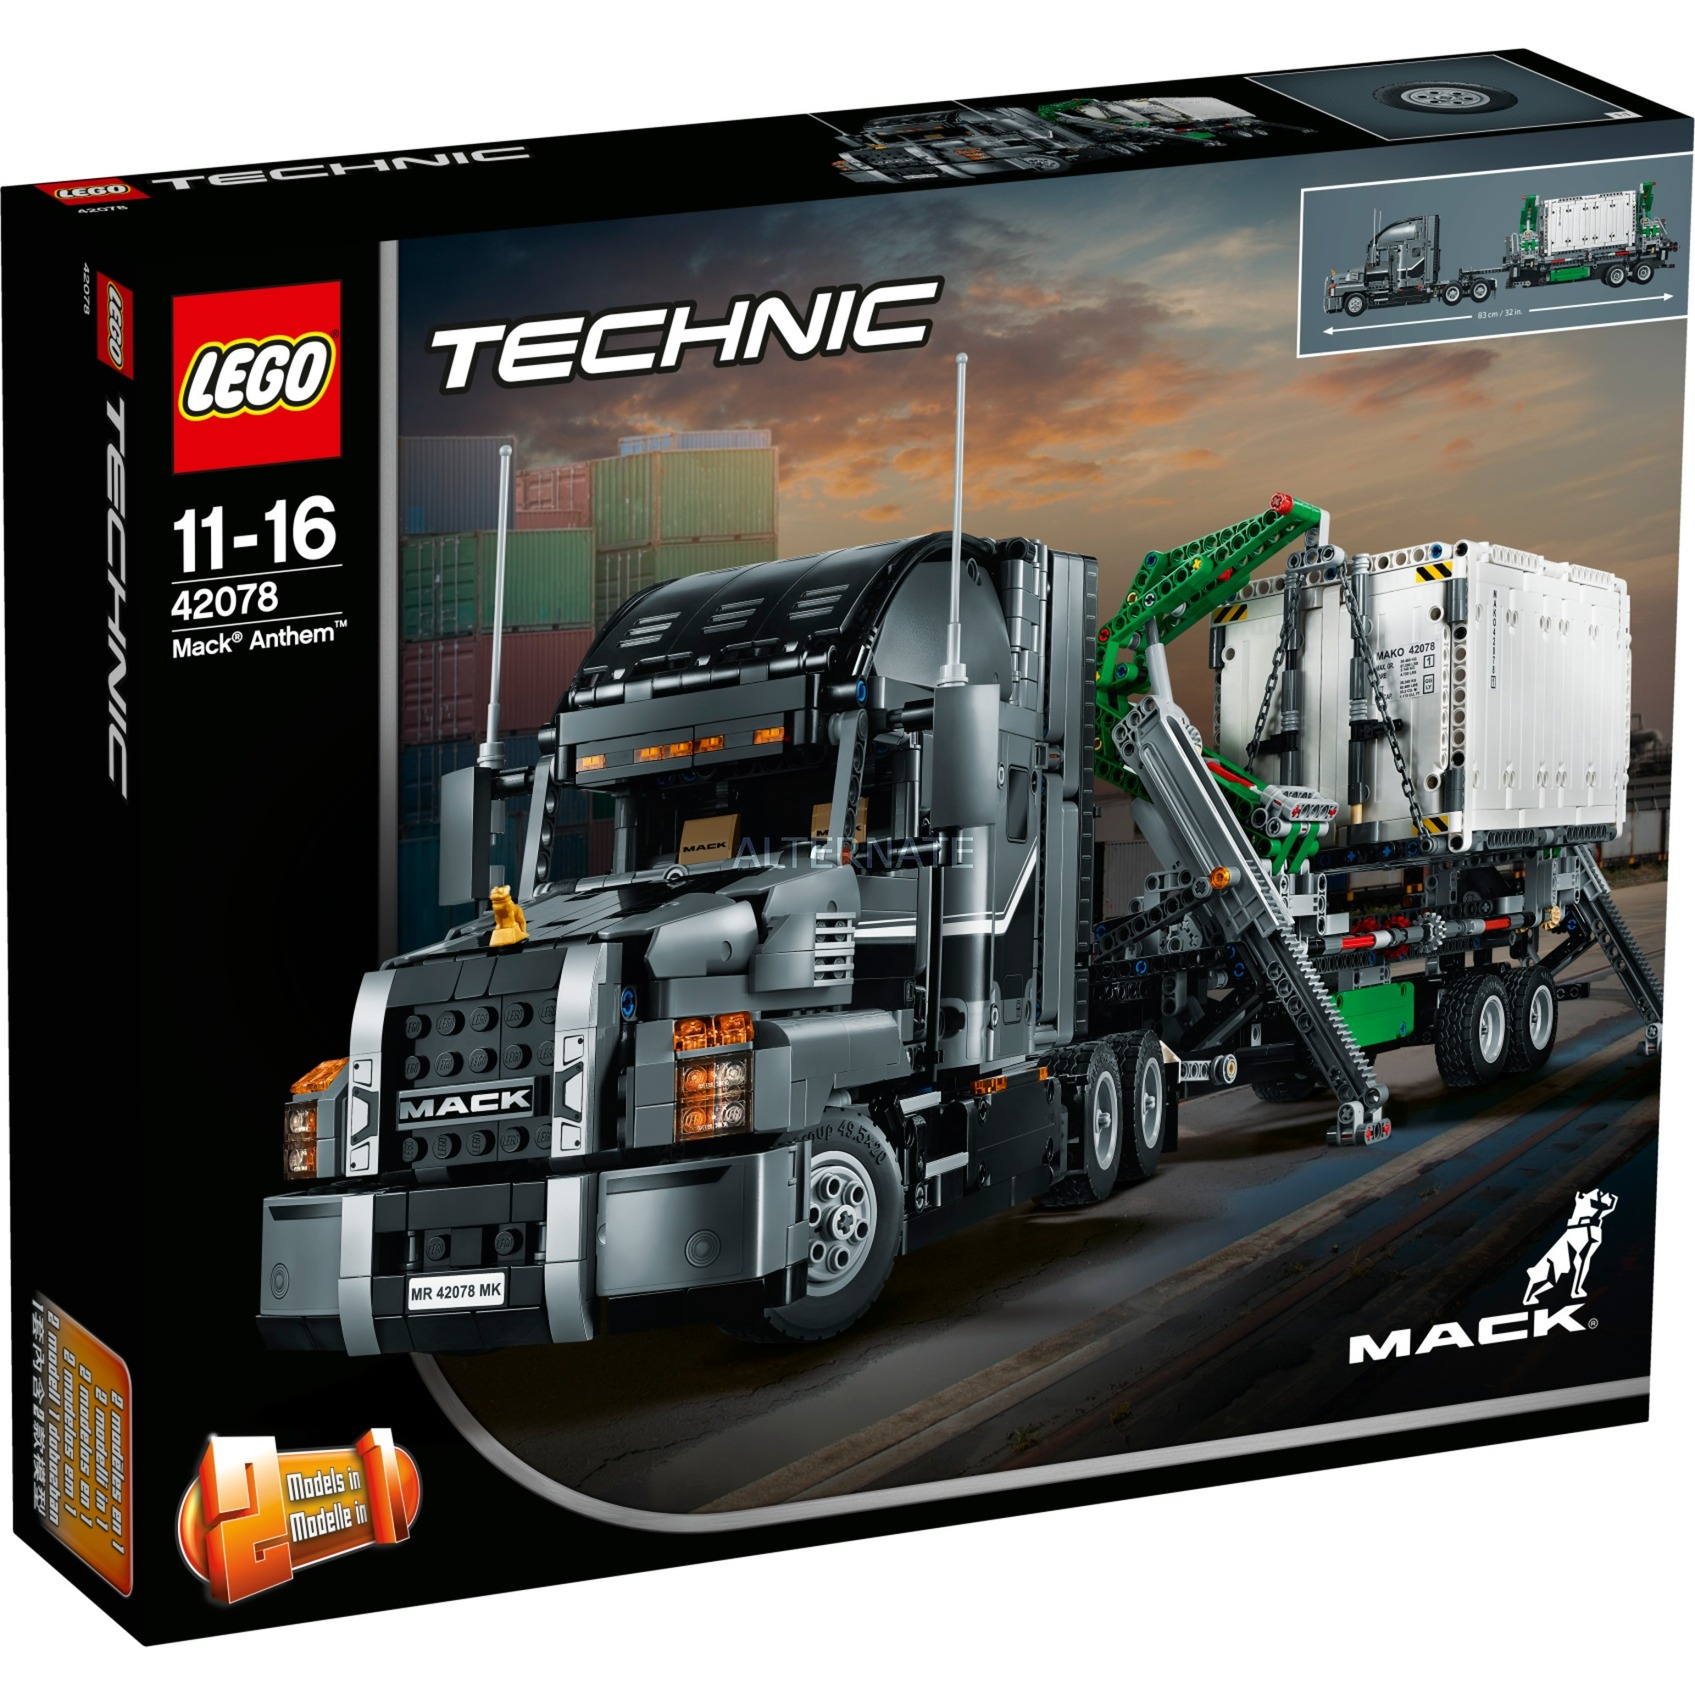 LEGO Technic - Mack Anthem - 42078